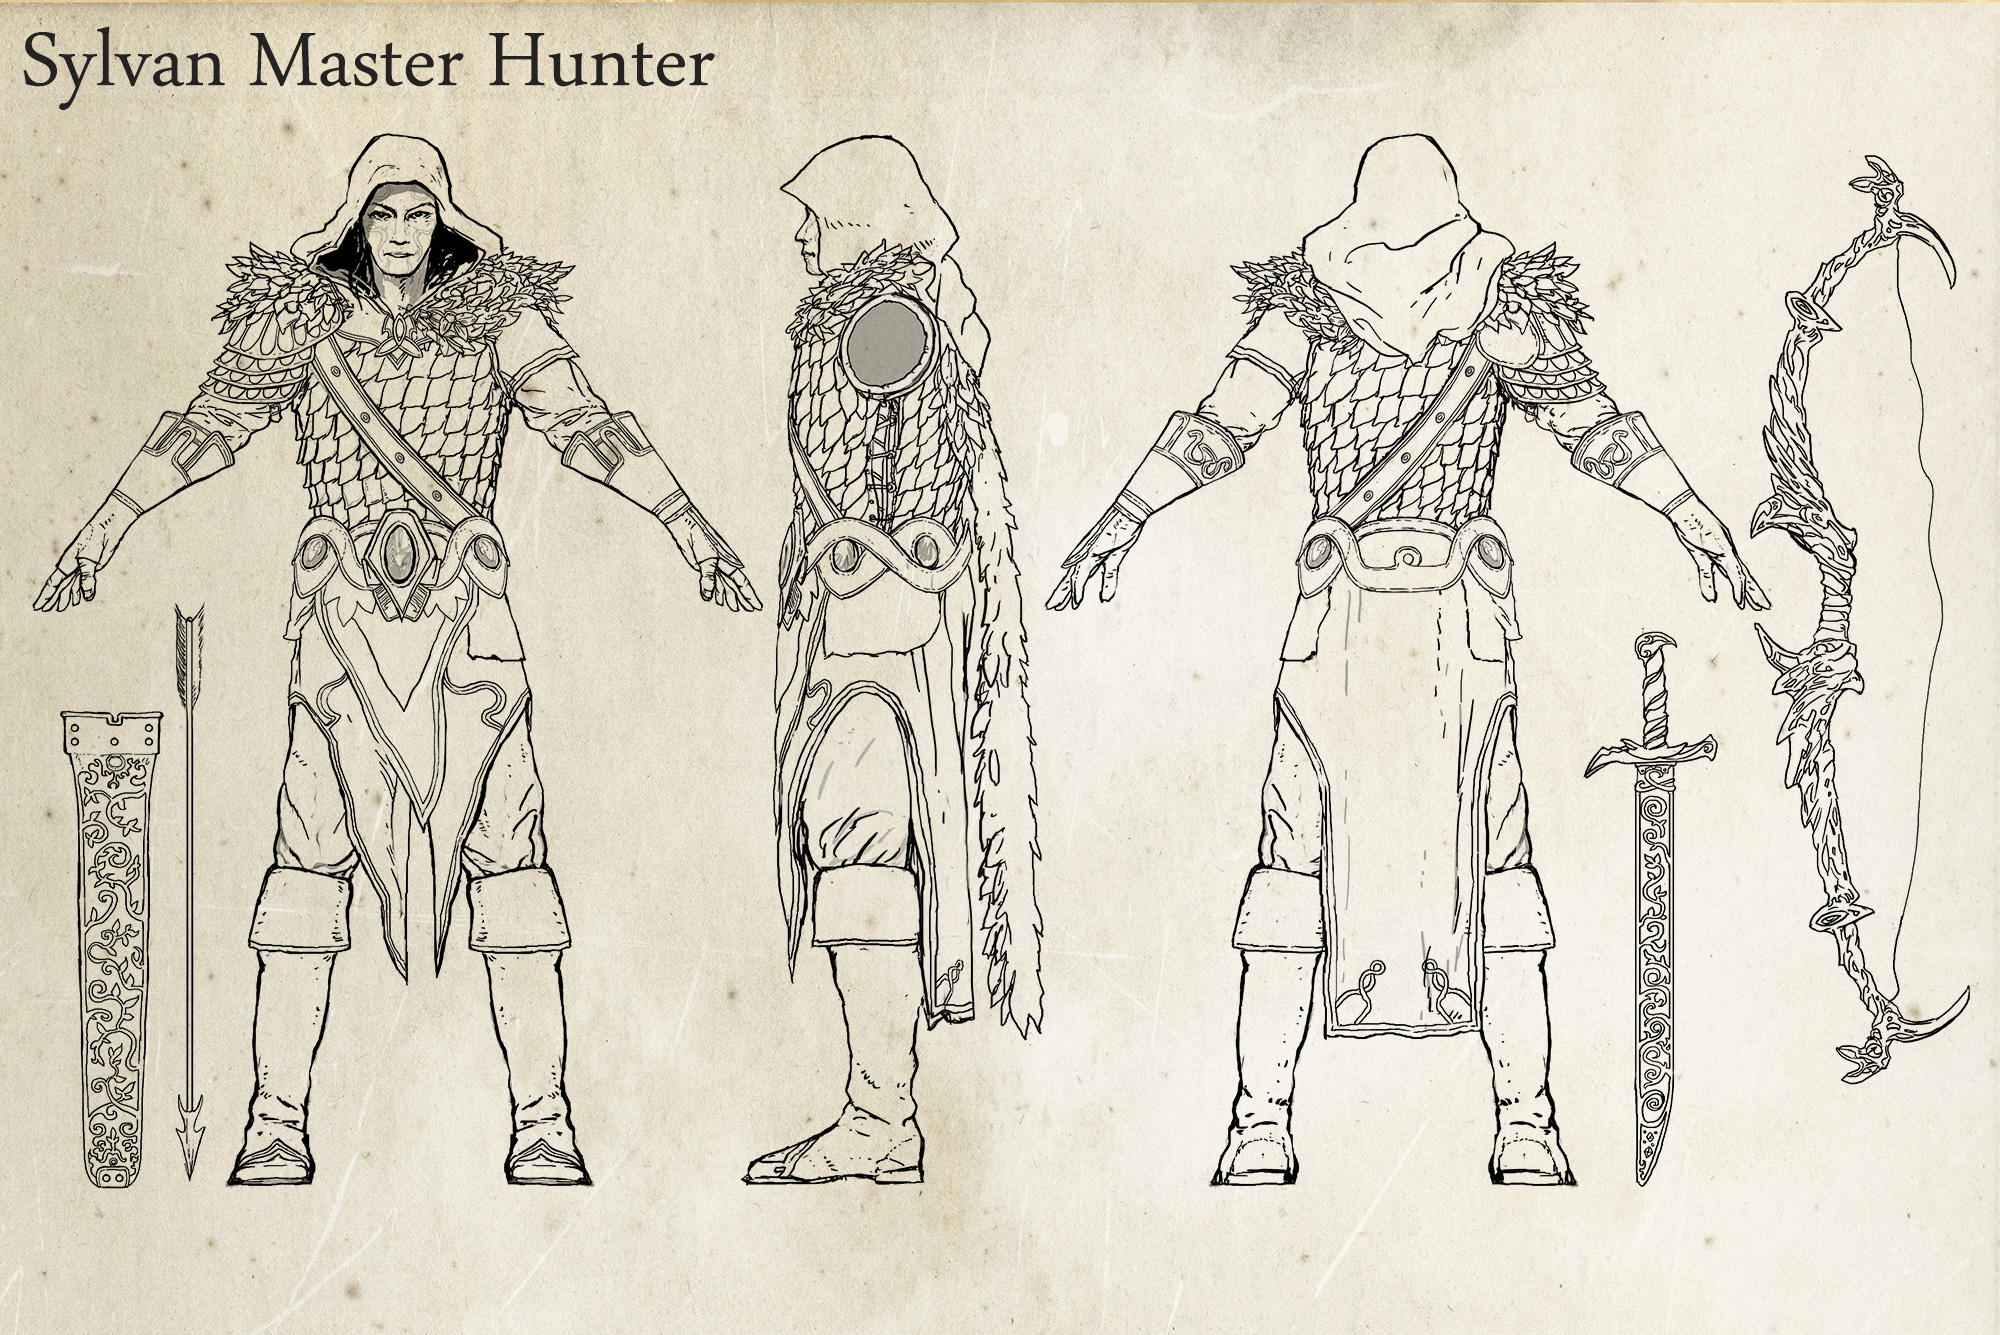 https://ubistatic-a.akamaihd.net/0004/prod/images/150622_Sylvan_1/MMH7_Master_Hunter_T.jpg